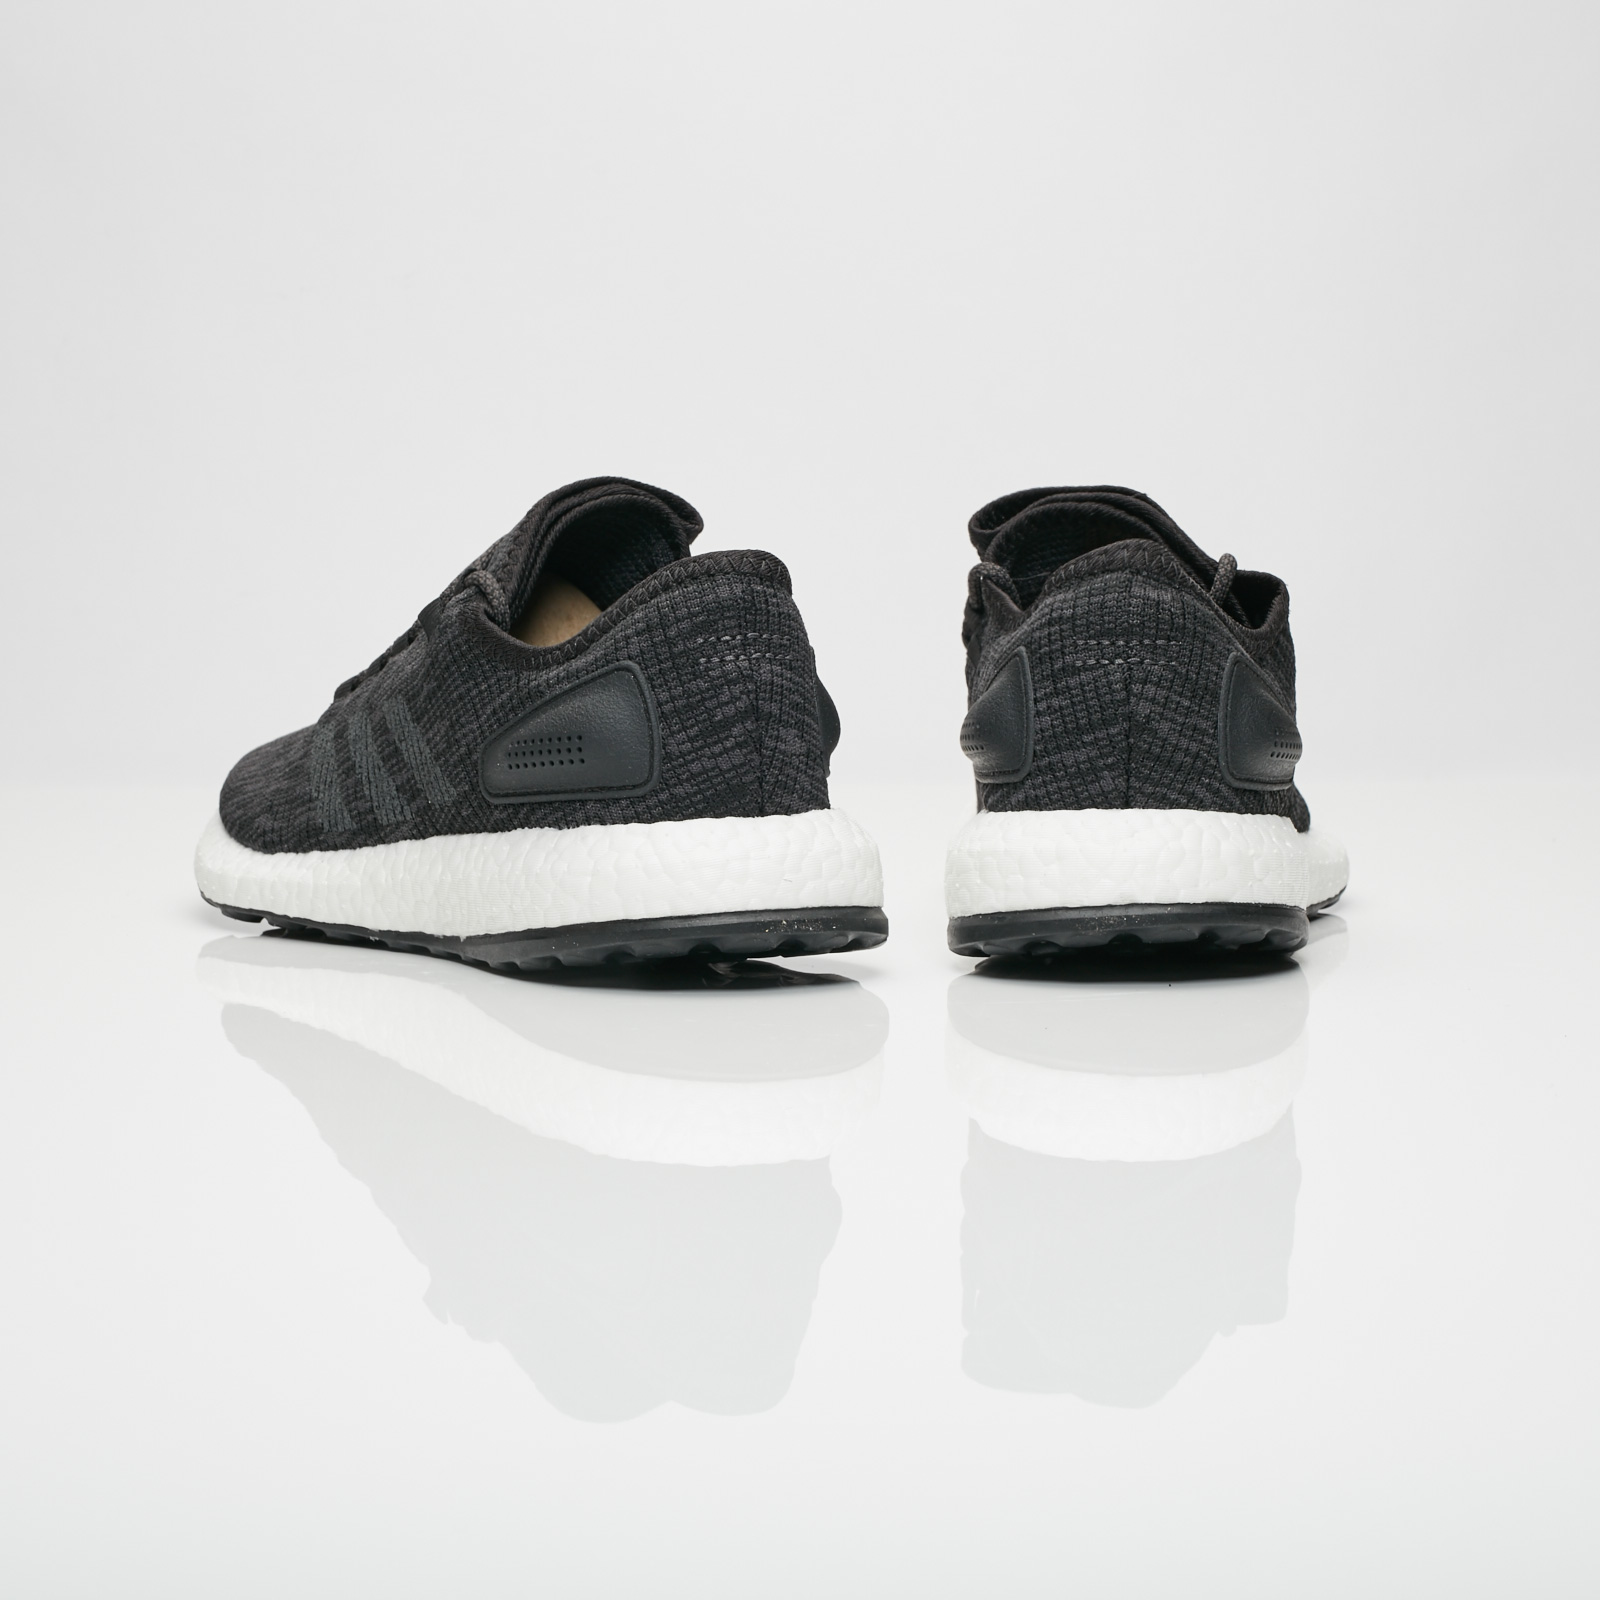 4bf5c3be3 adidas PureBOOST - Cp9326 - Sneakersnstuff